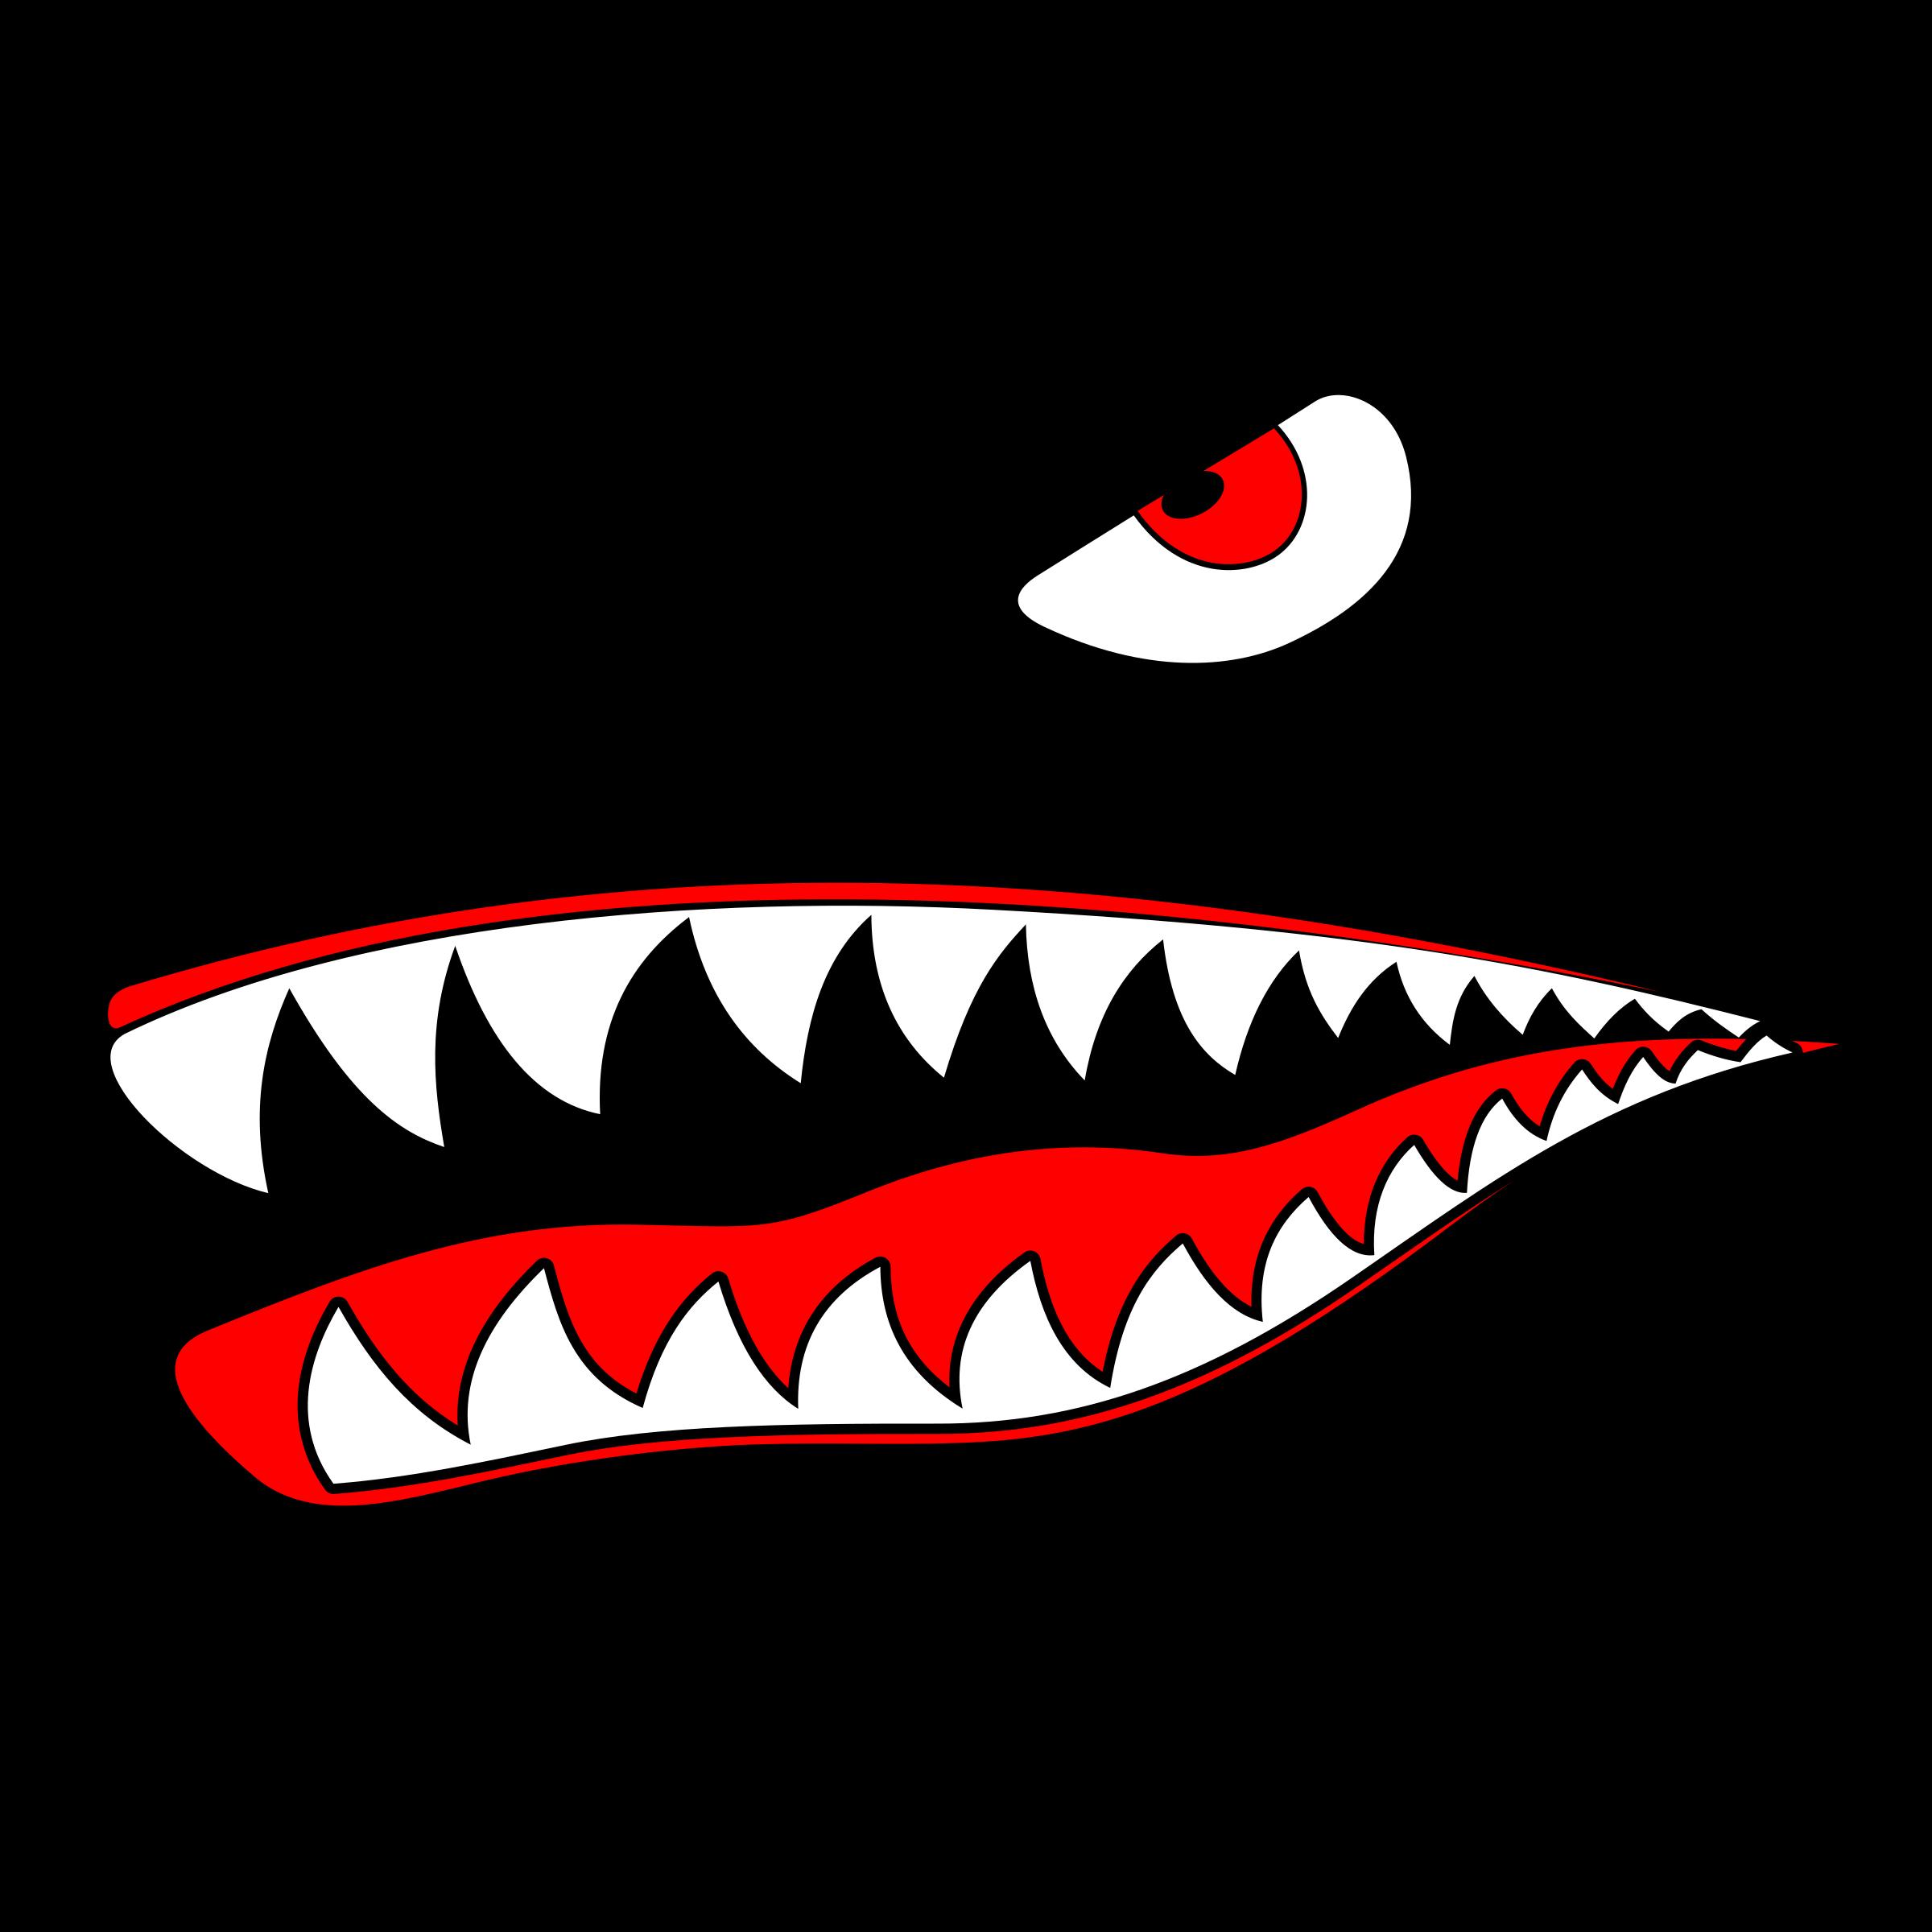 2400x2400 Teeth Clipart Graphic